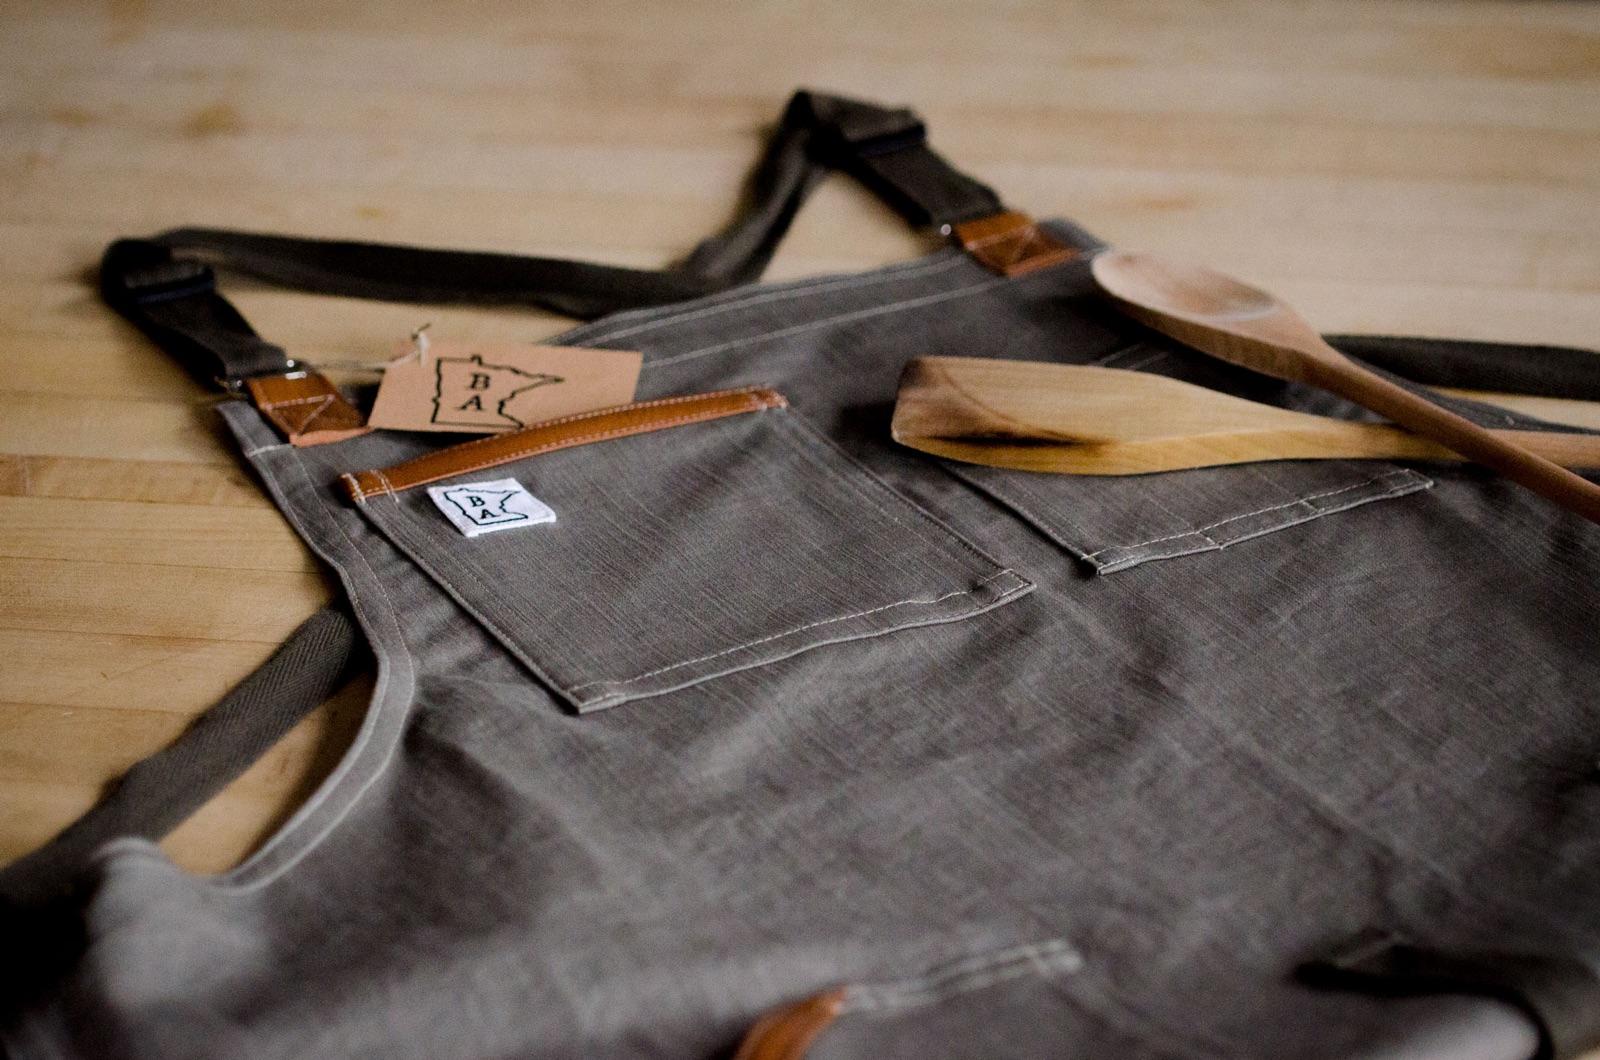 MNMO June Goods Craftmade apron.jpeg